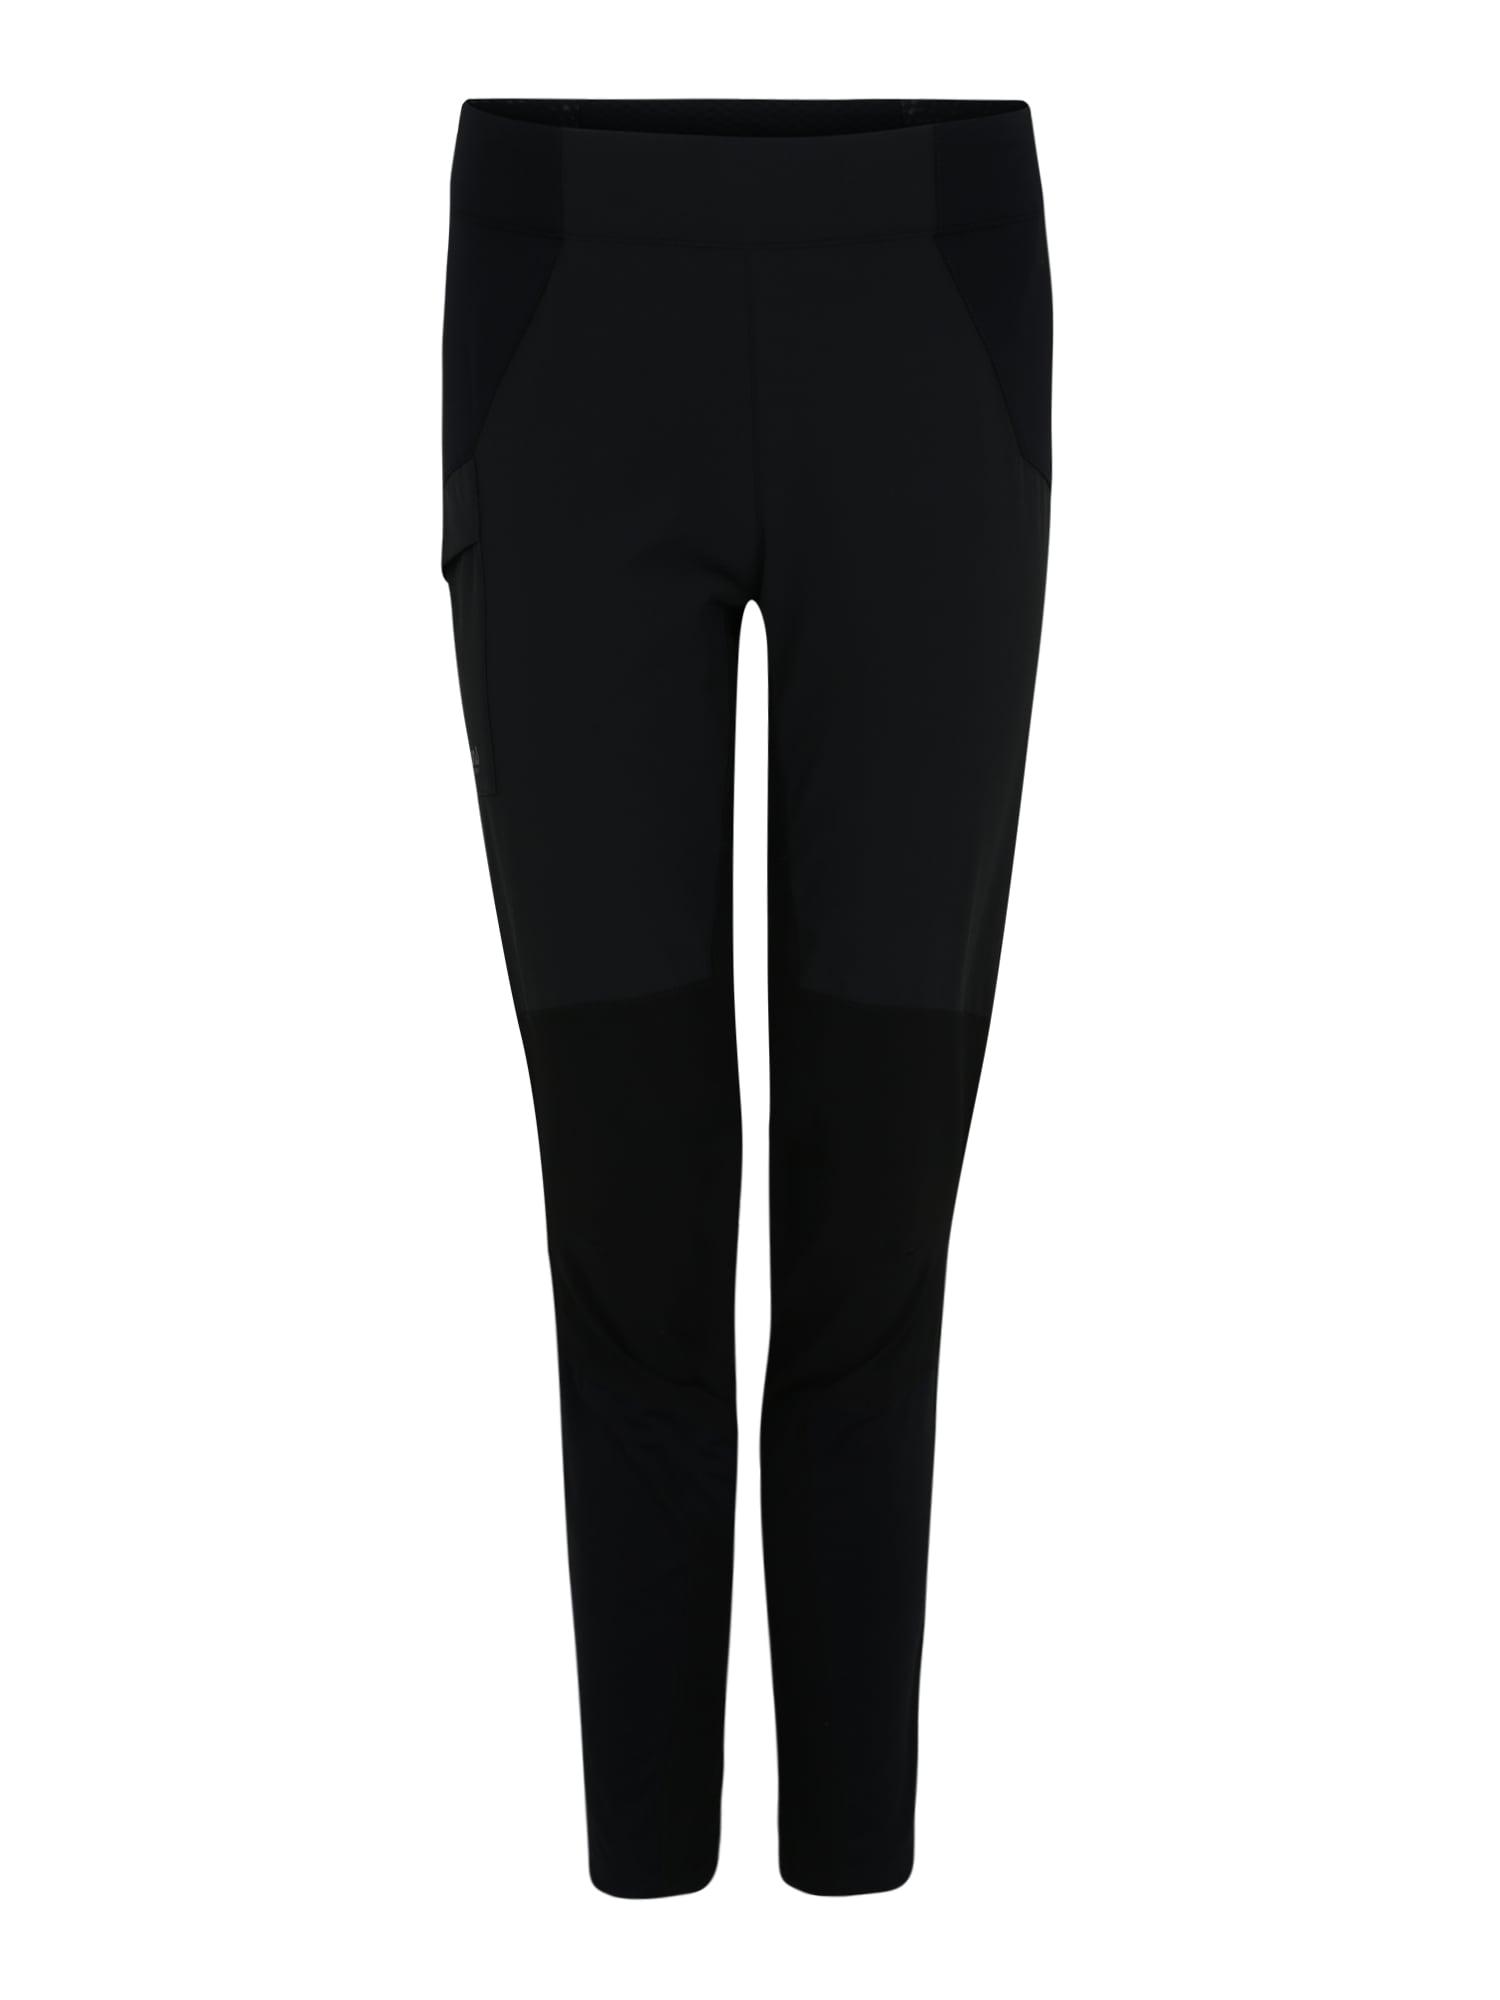 Bergans Laisvalaikio kelnės 'Fløyen' juoda